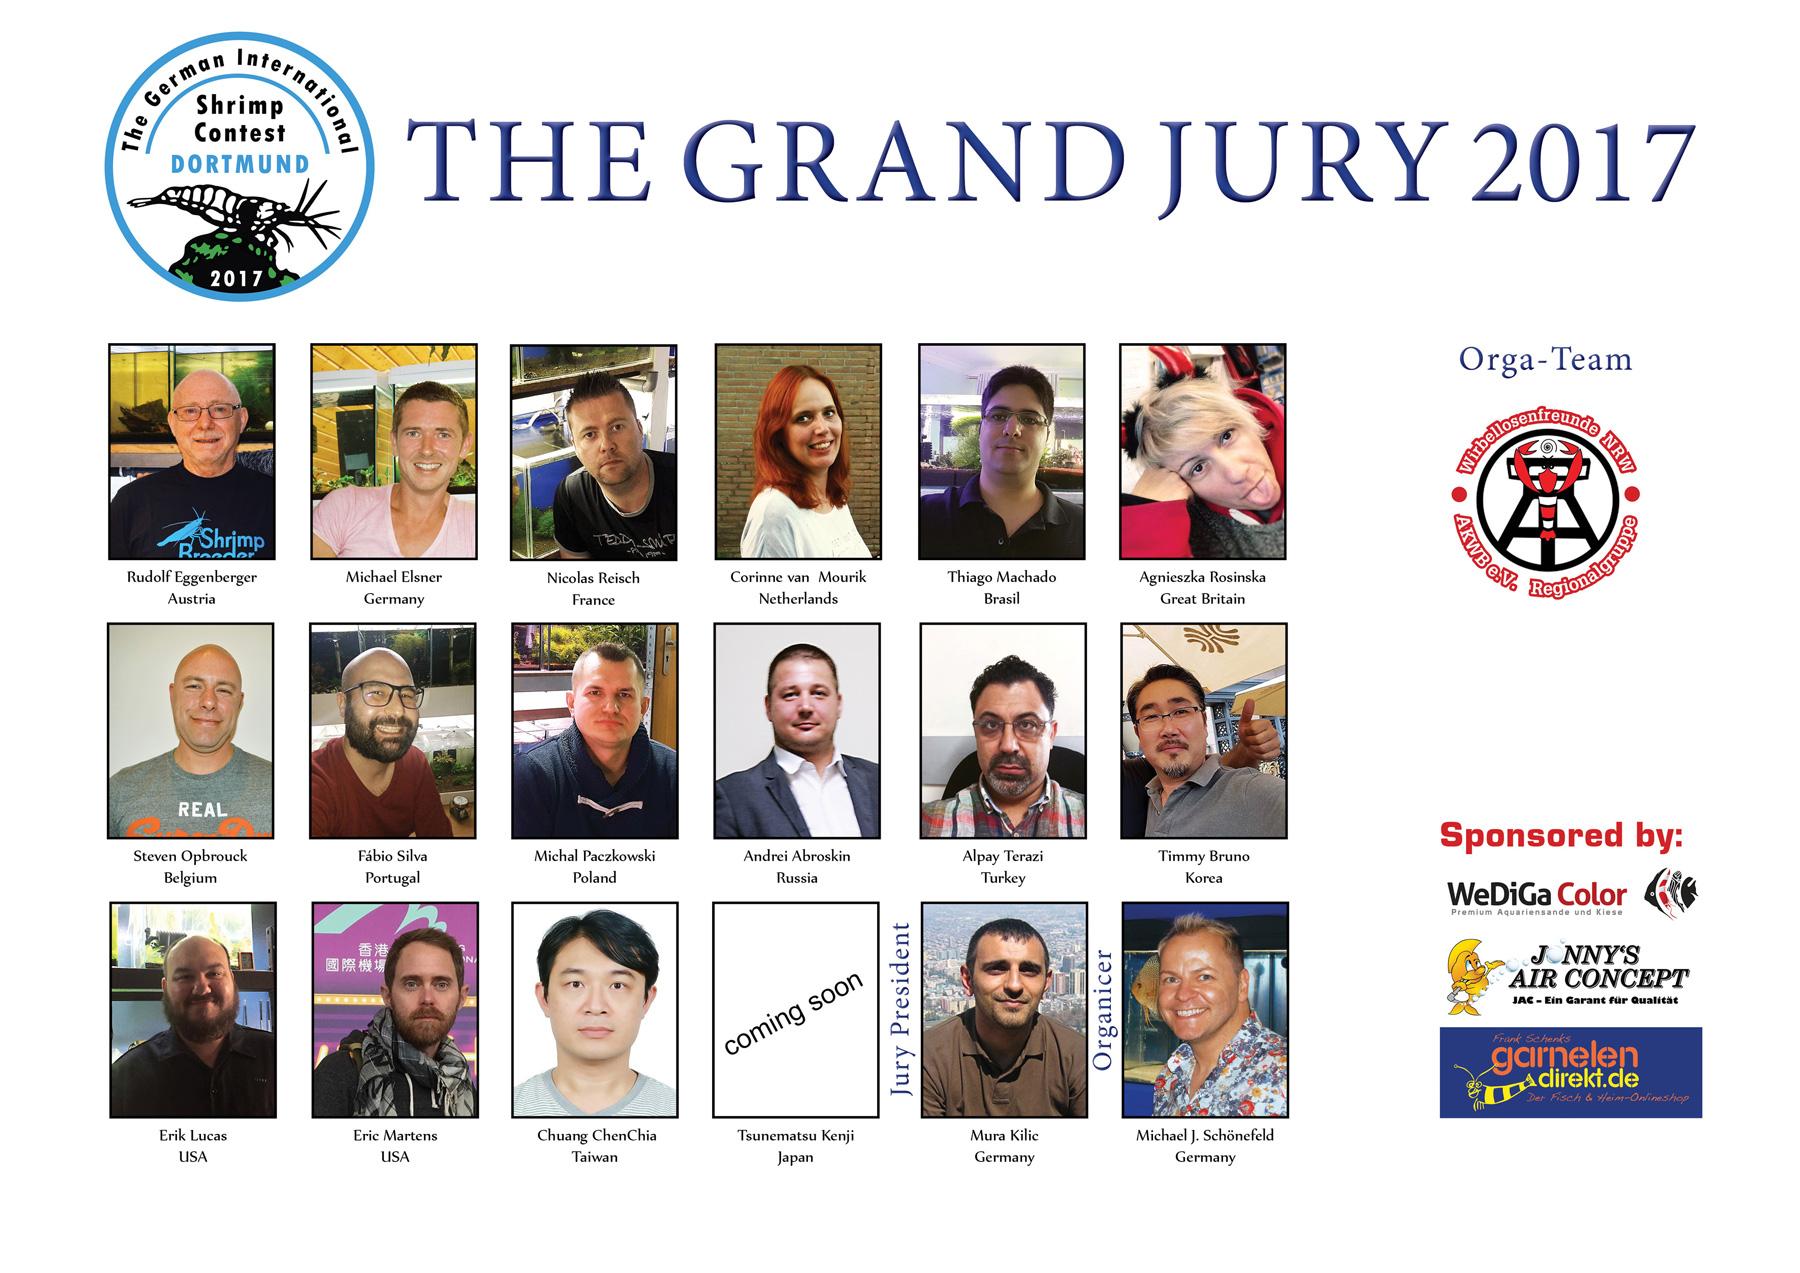 TGISC - The Grand Jury 2017 - aqua EXPO Tage - Dortmund